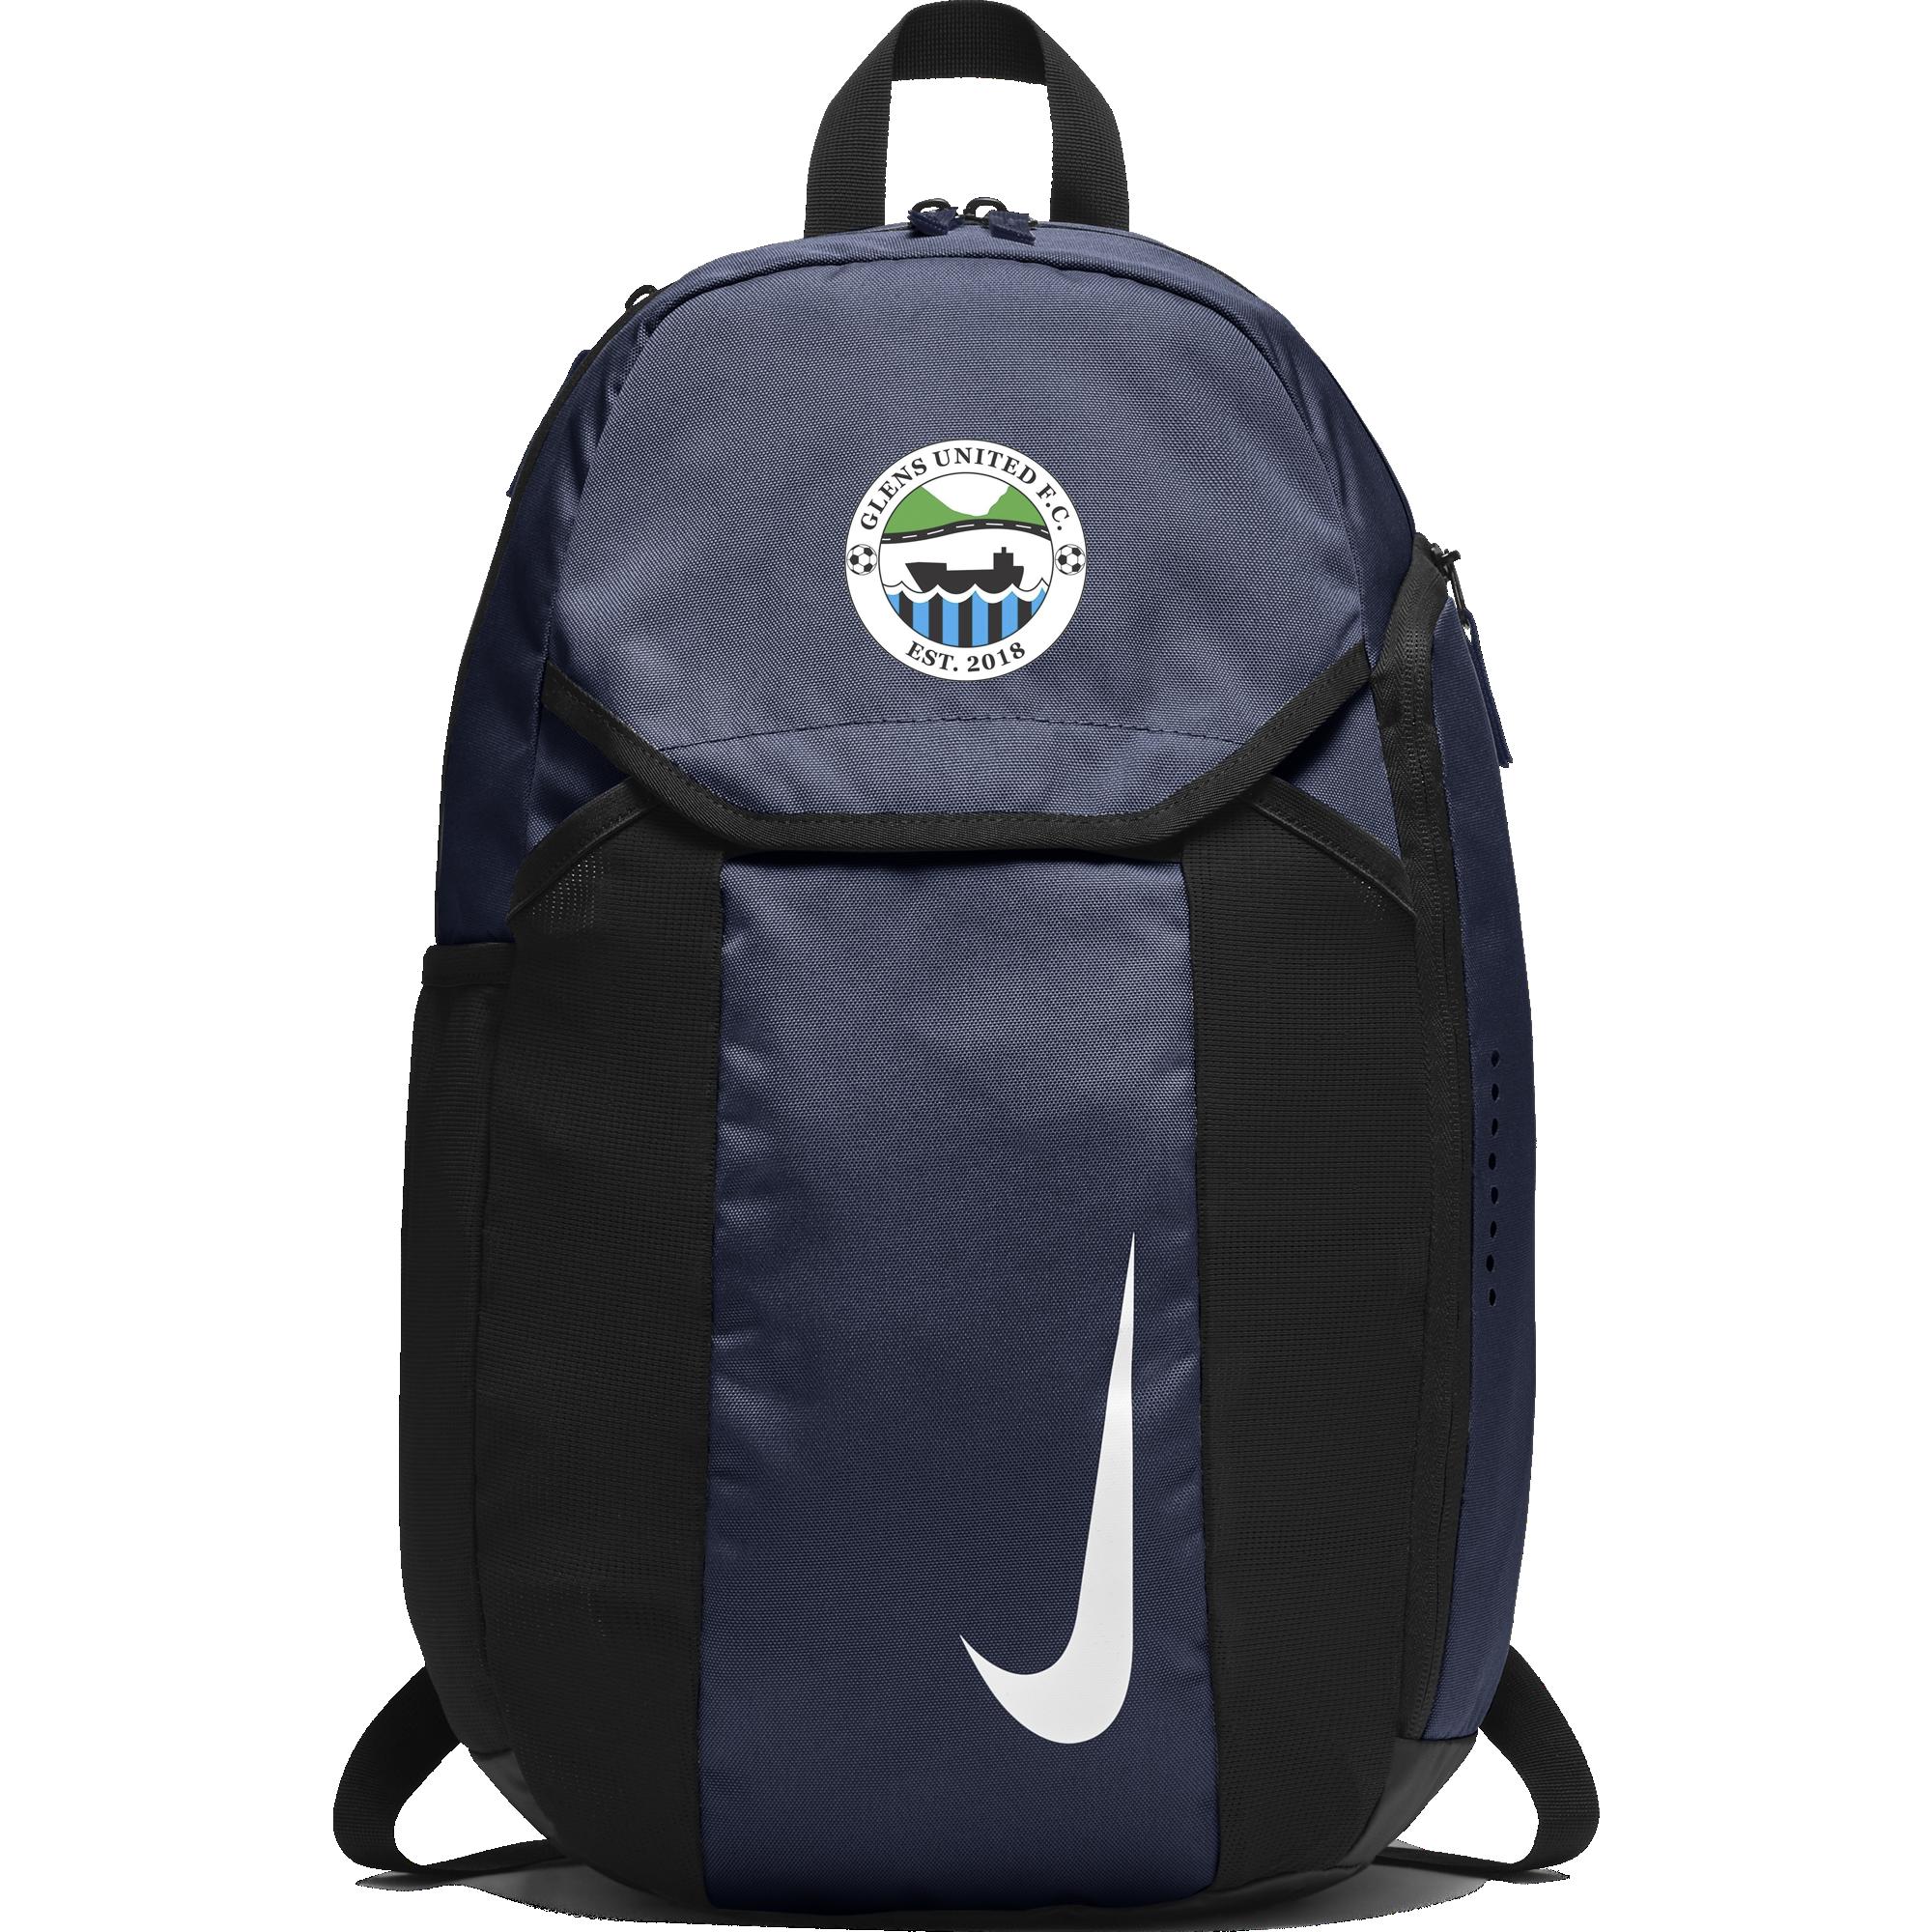 Glens united backpack